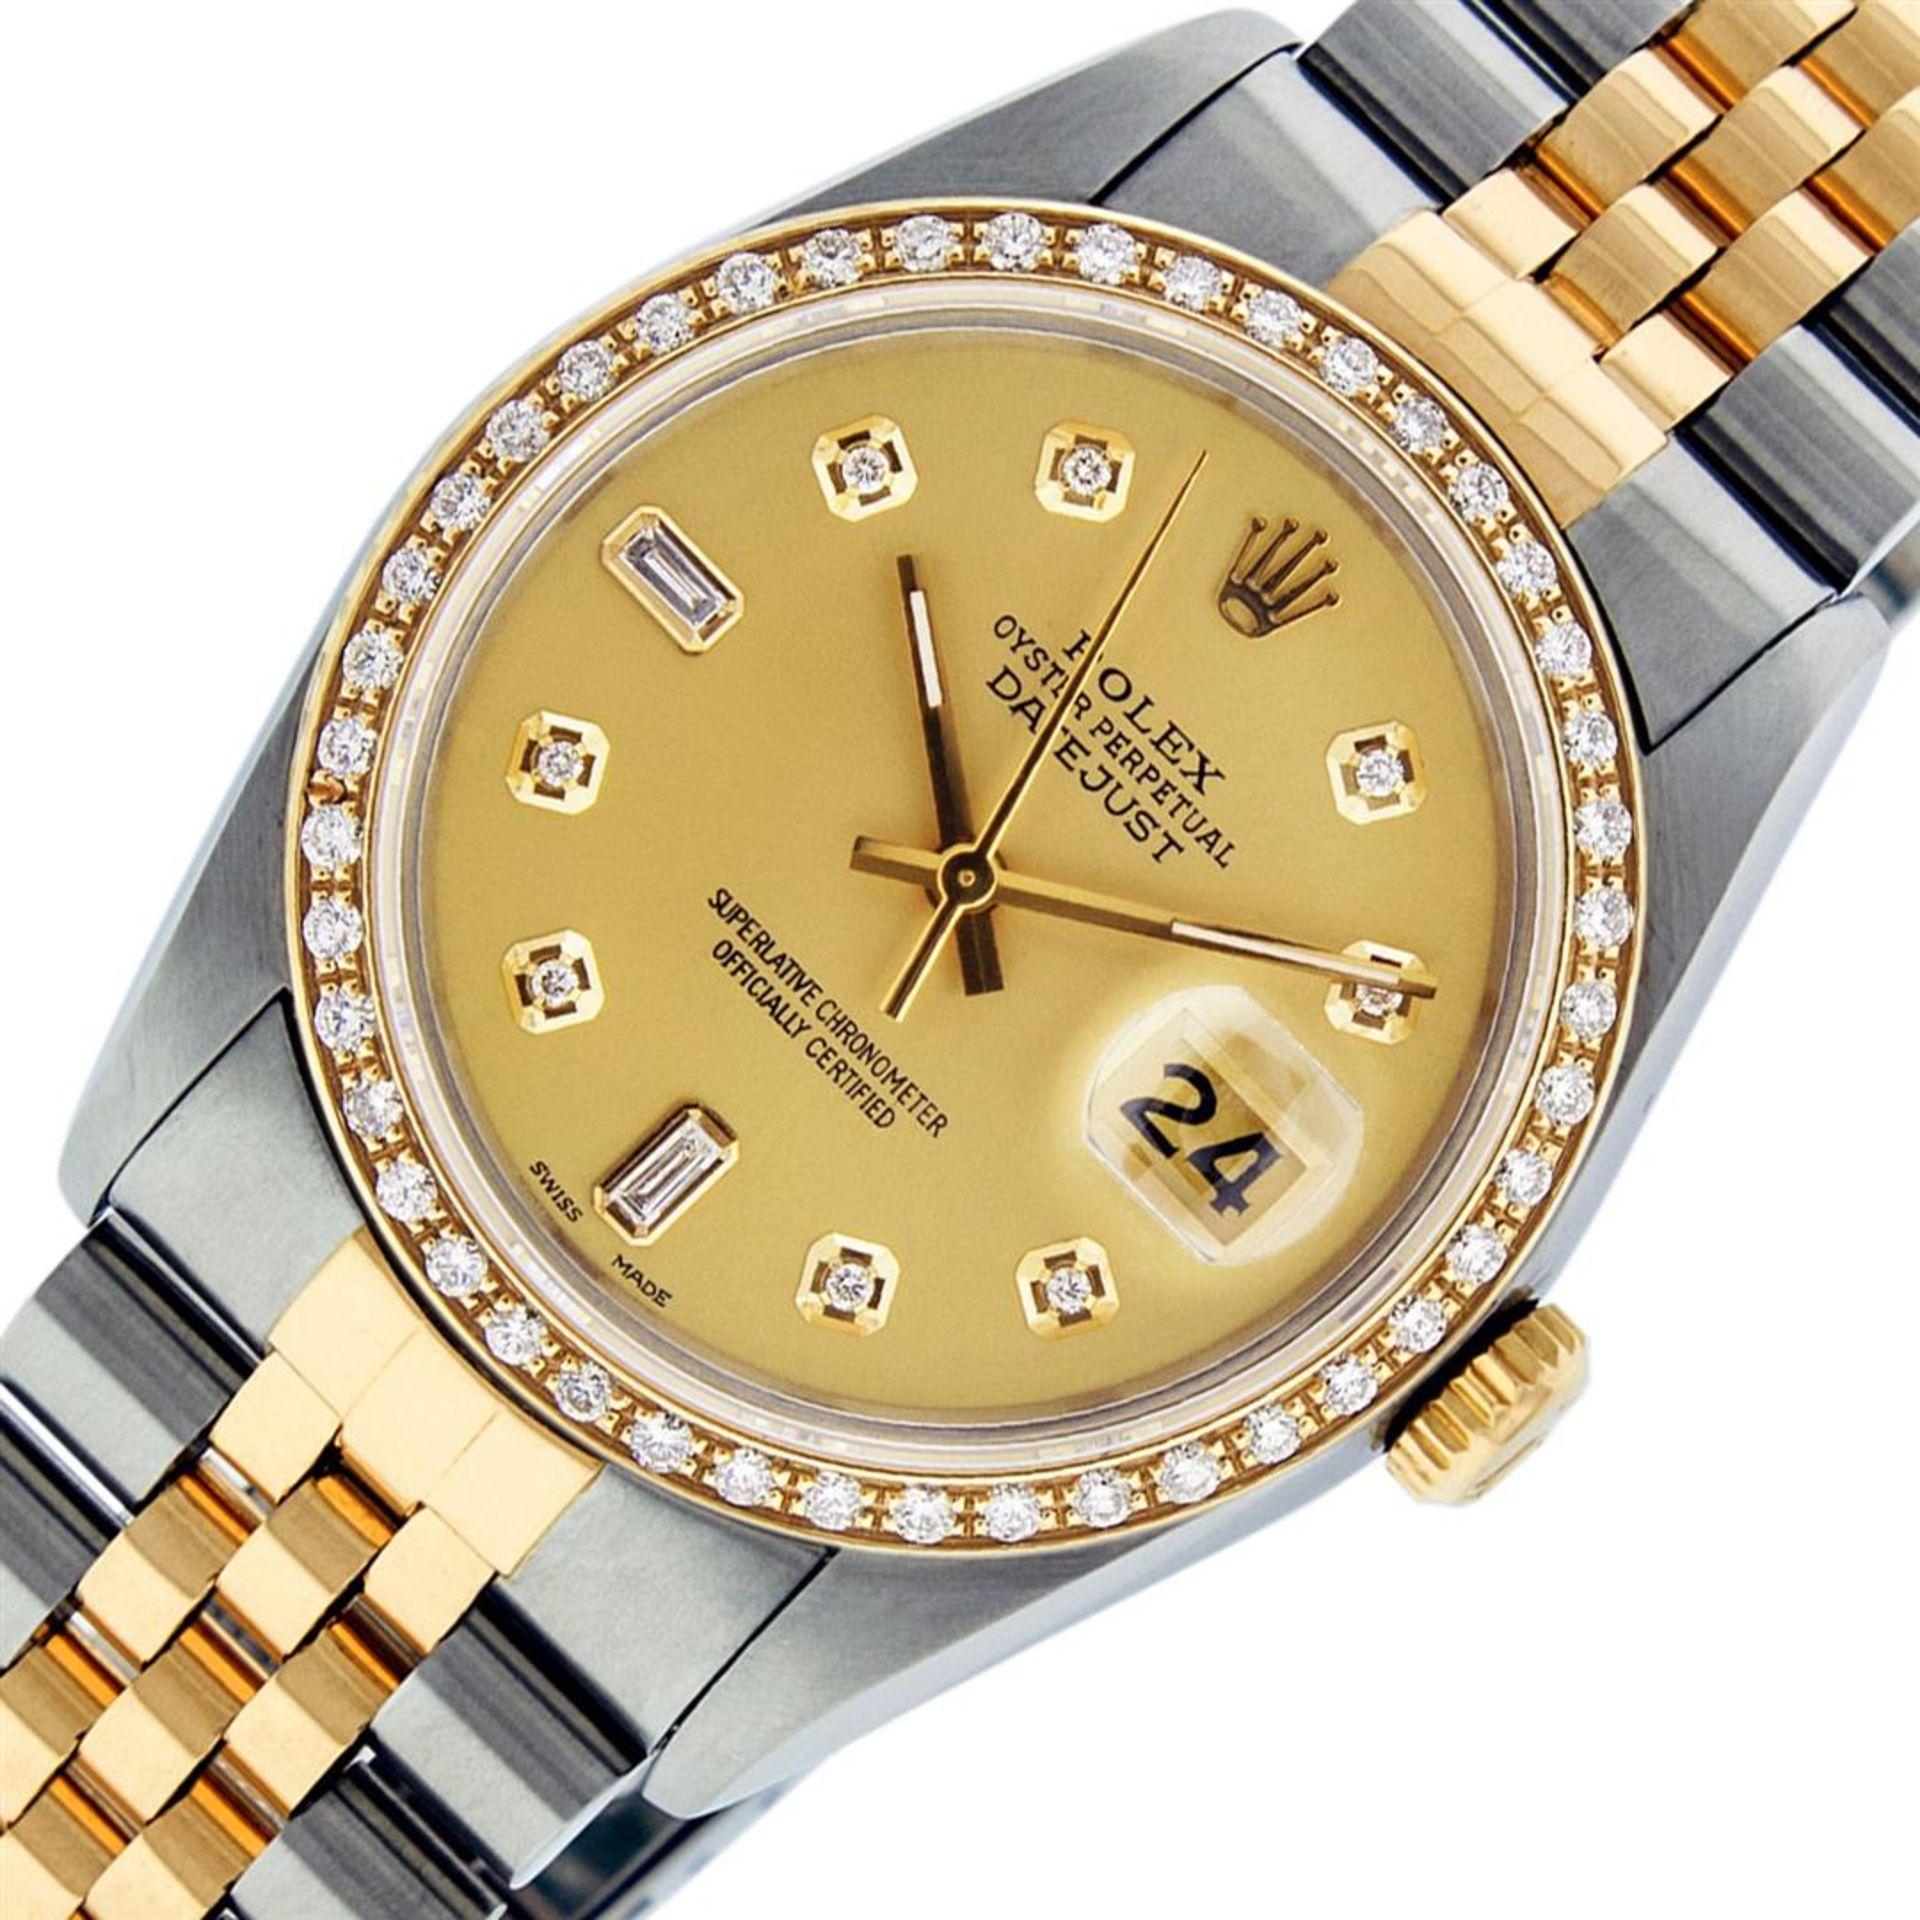 Rolex Mens 2 Tone Champagne Diamond 36MM Datejust Wriswatch - Image 2 of 9